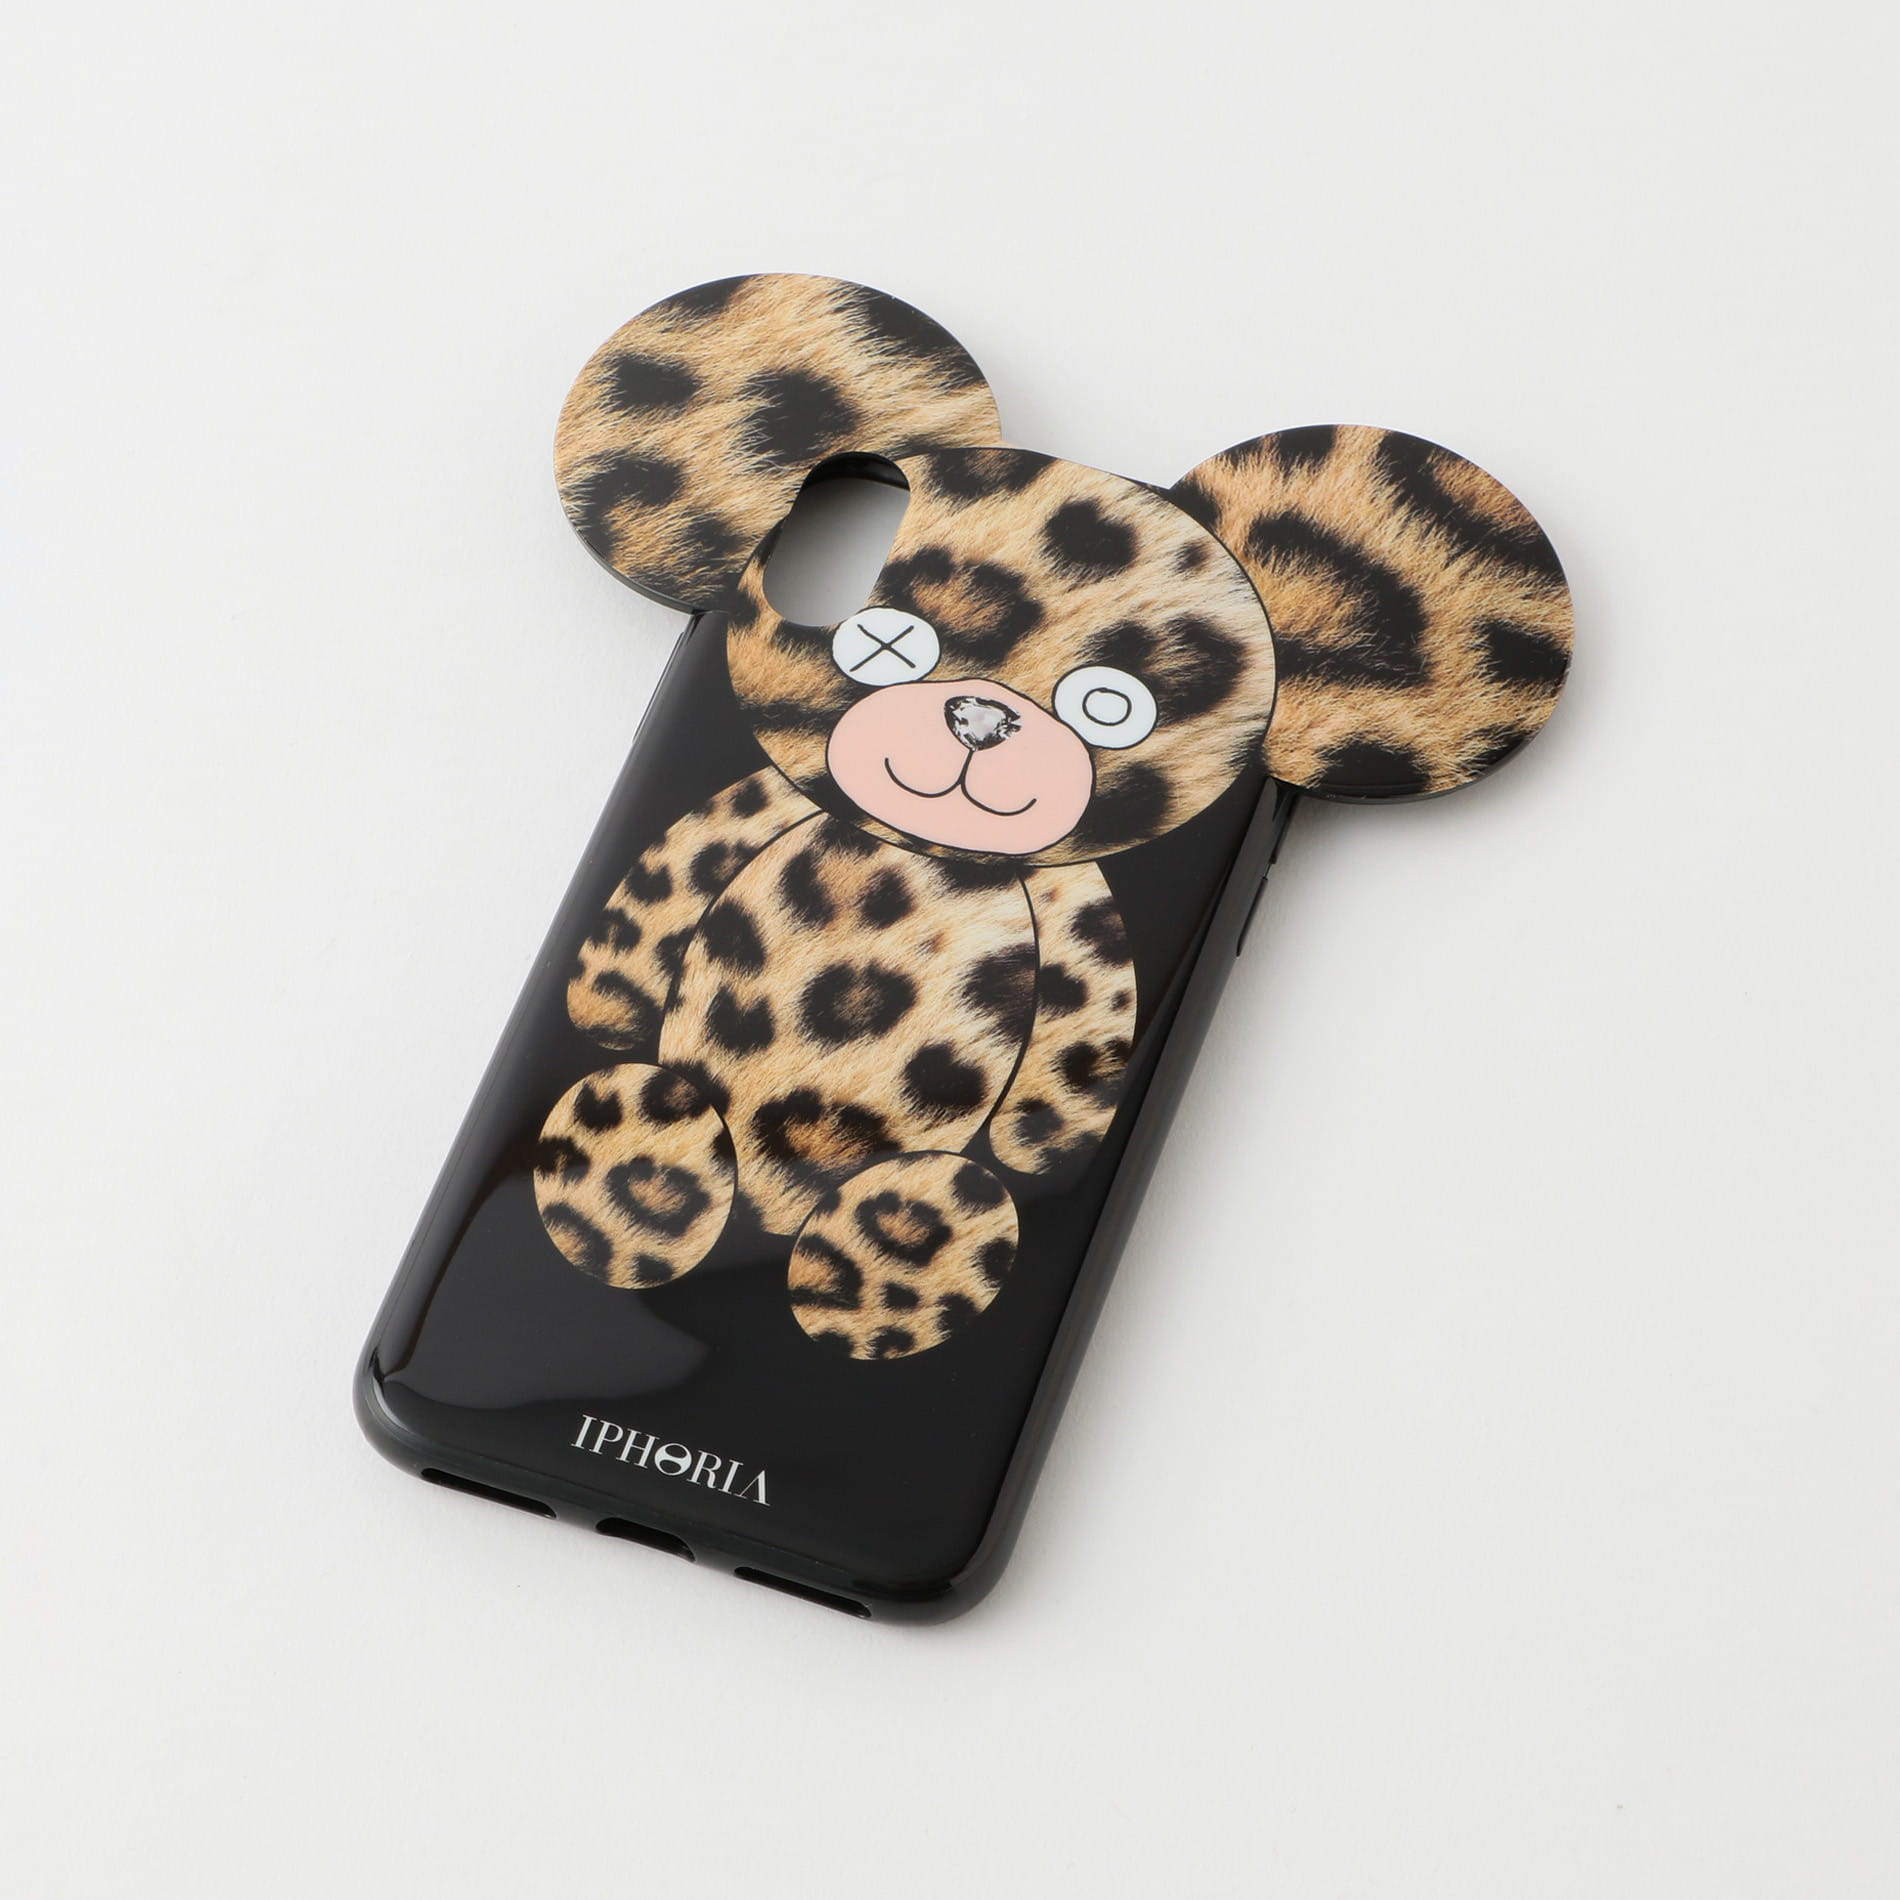 【IPHORIA】iPhoneケース(iPhoneX/XS対応)-Leo Bear-